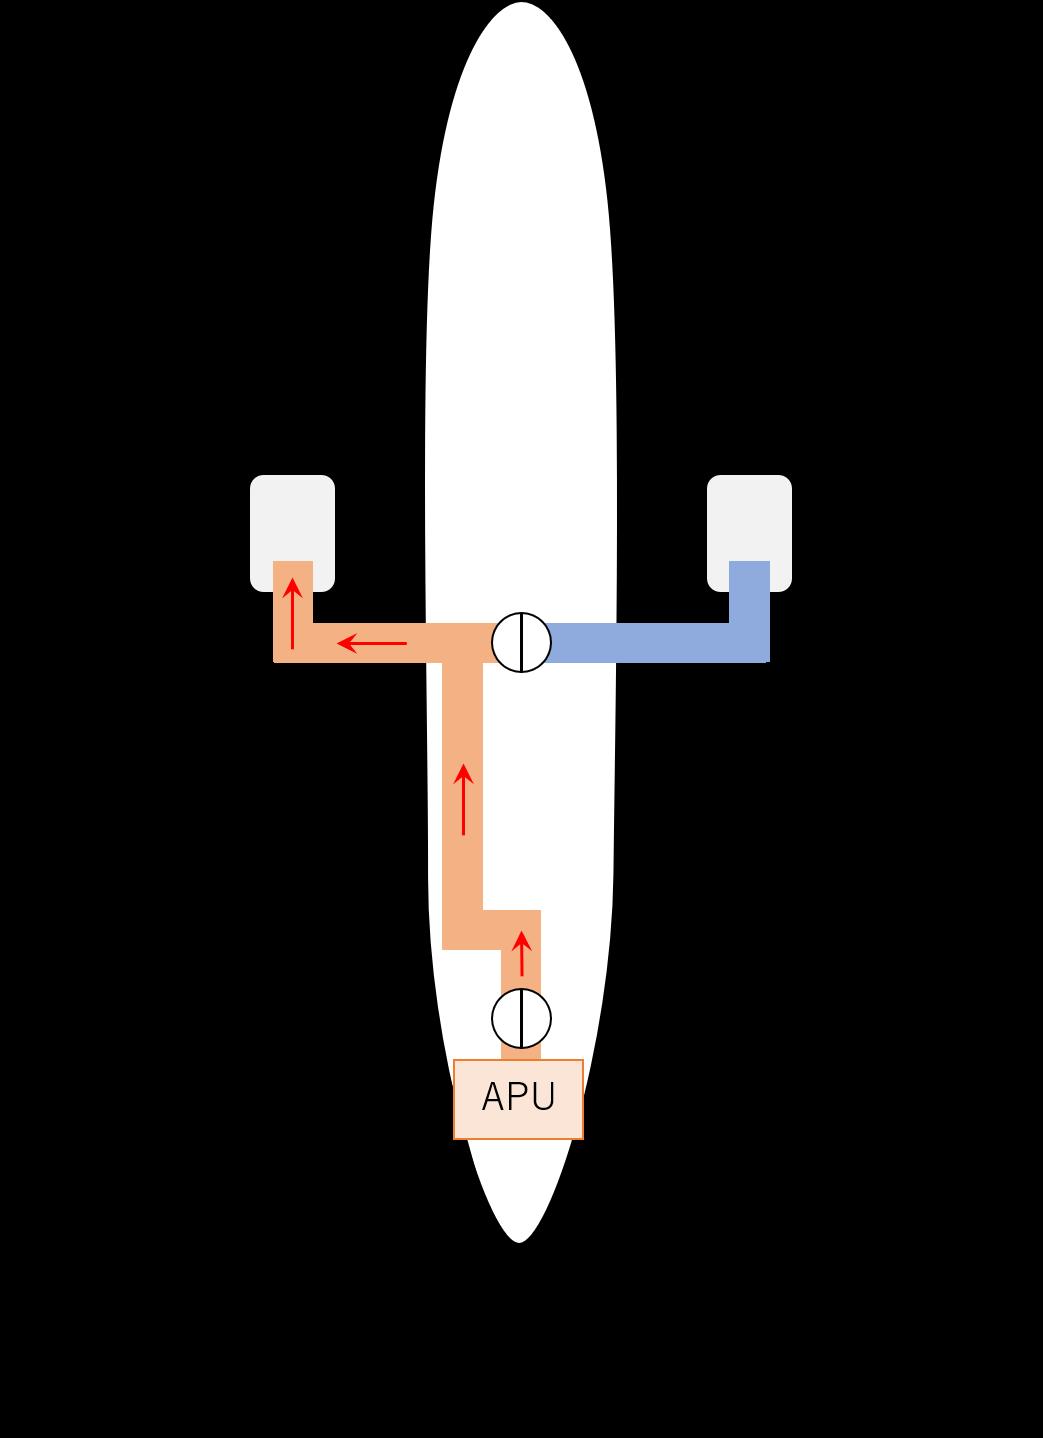 APUがエンジンスタート用に圧縮空気を供給する様子